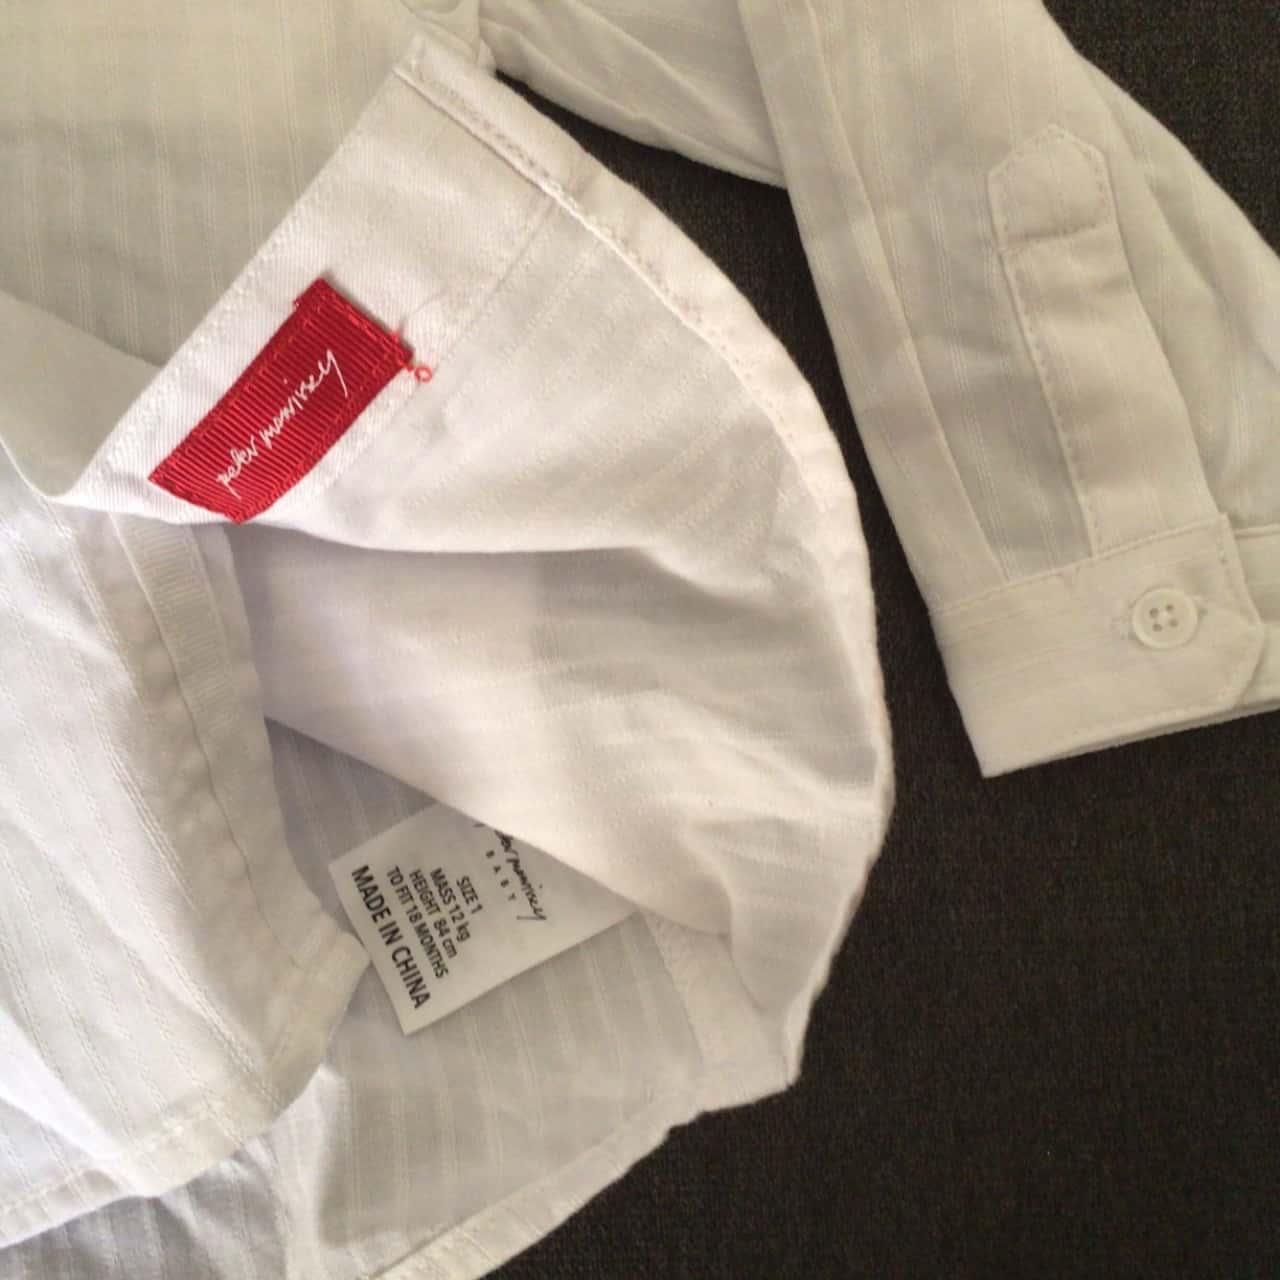 BNWT BABY BOY SHIRT & TIE SET Size 1 White